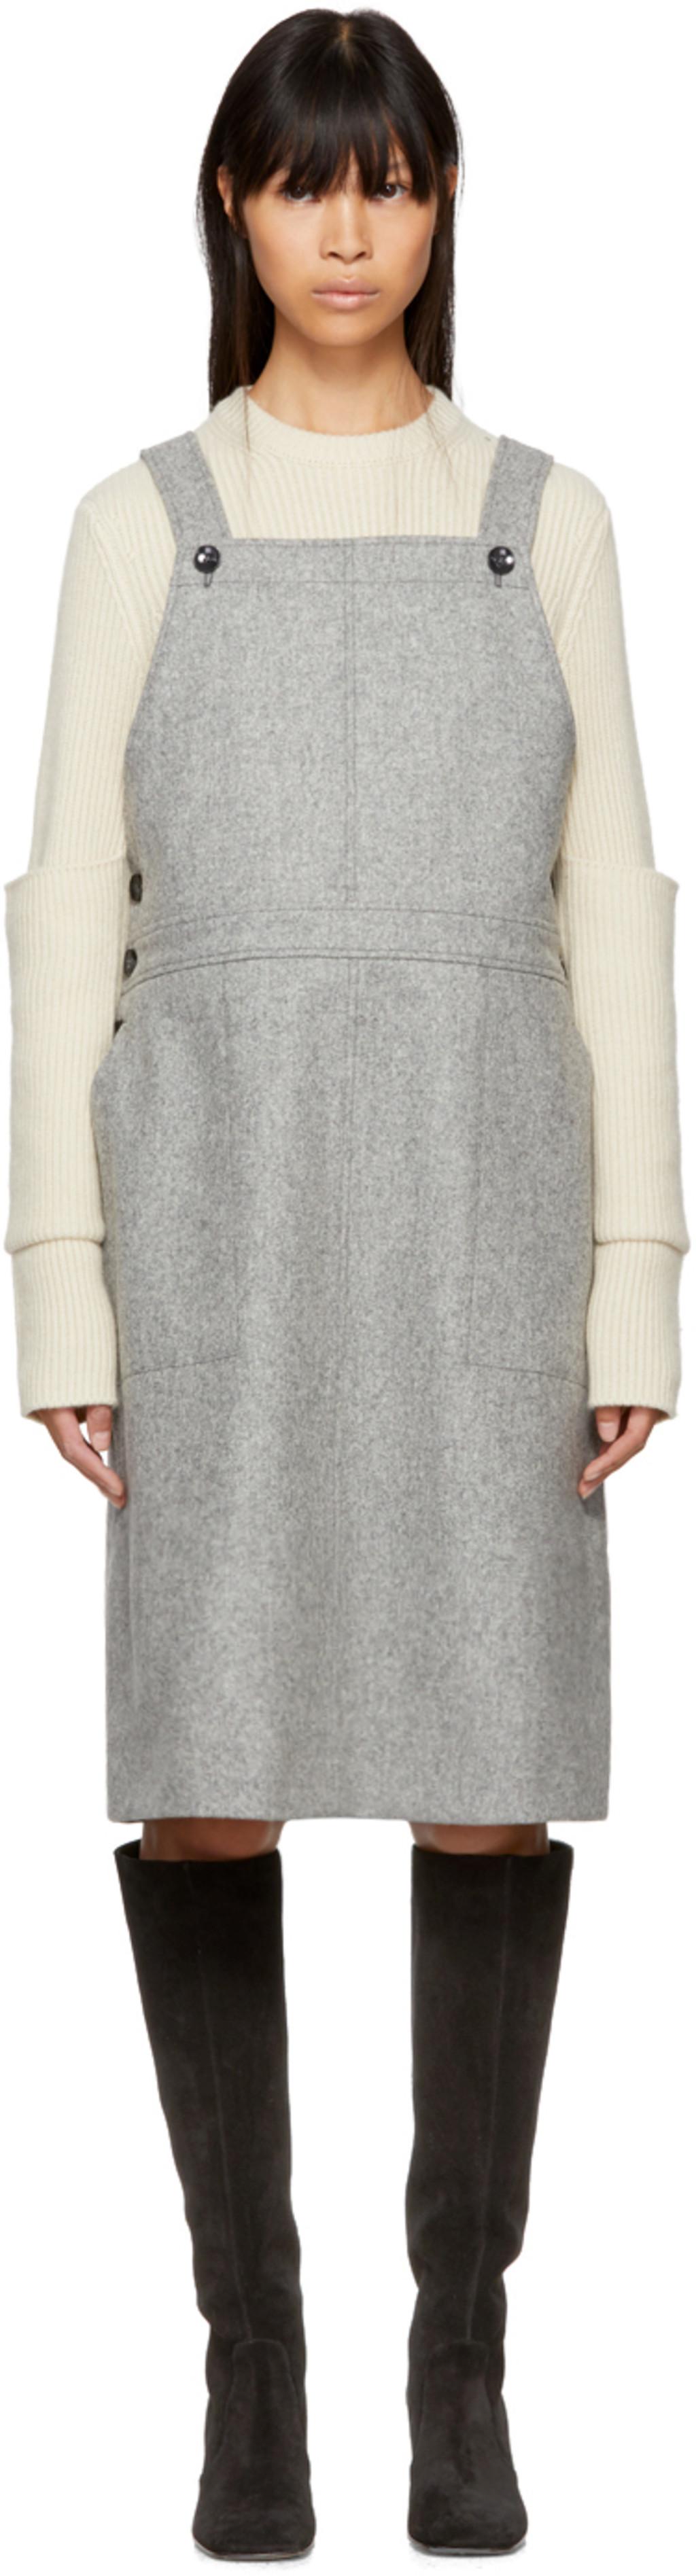 Grey Anni Dress Ymc You Must Create